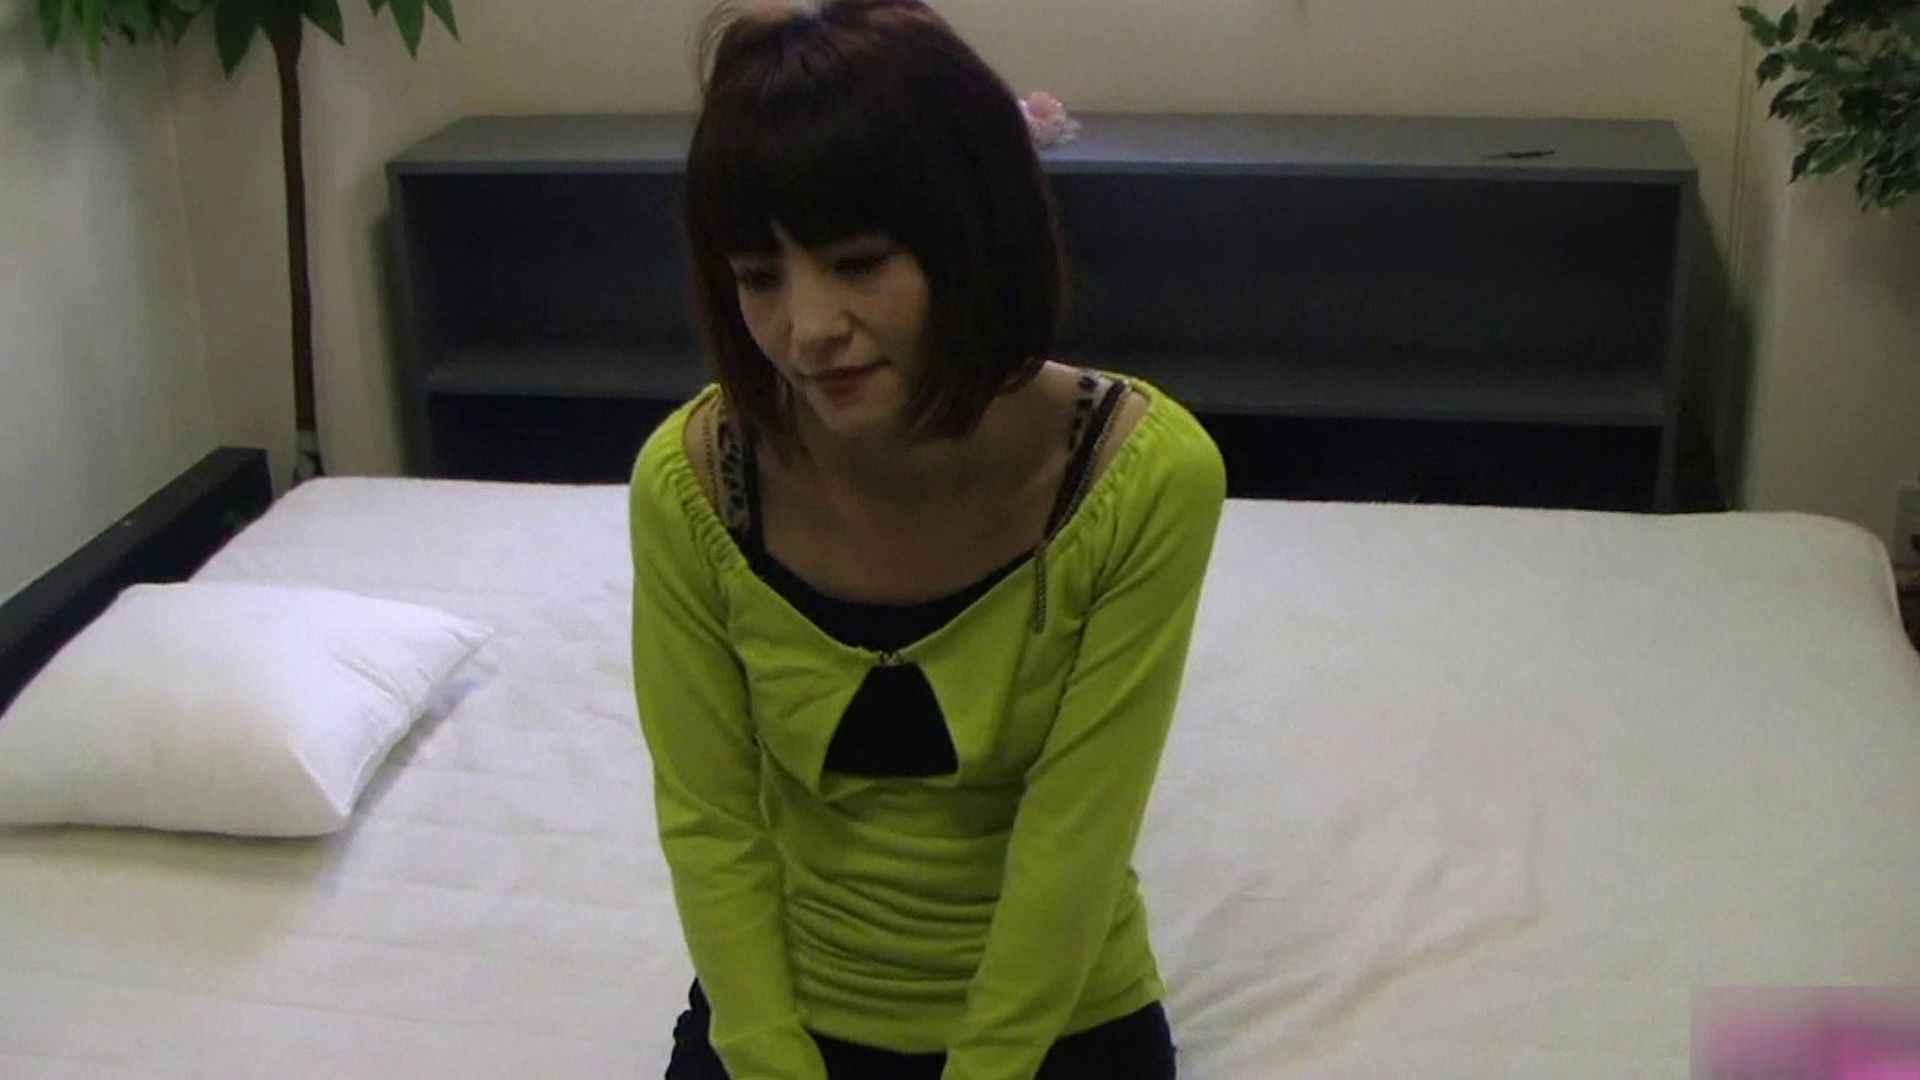 S級厳選美女ビッチガールVol.26 美女ヌード | OLセックス  72画像 5